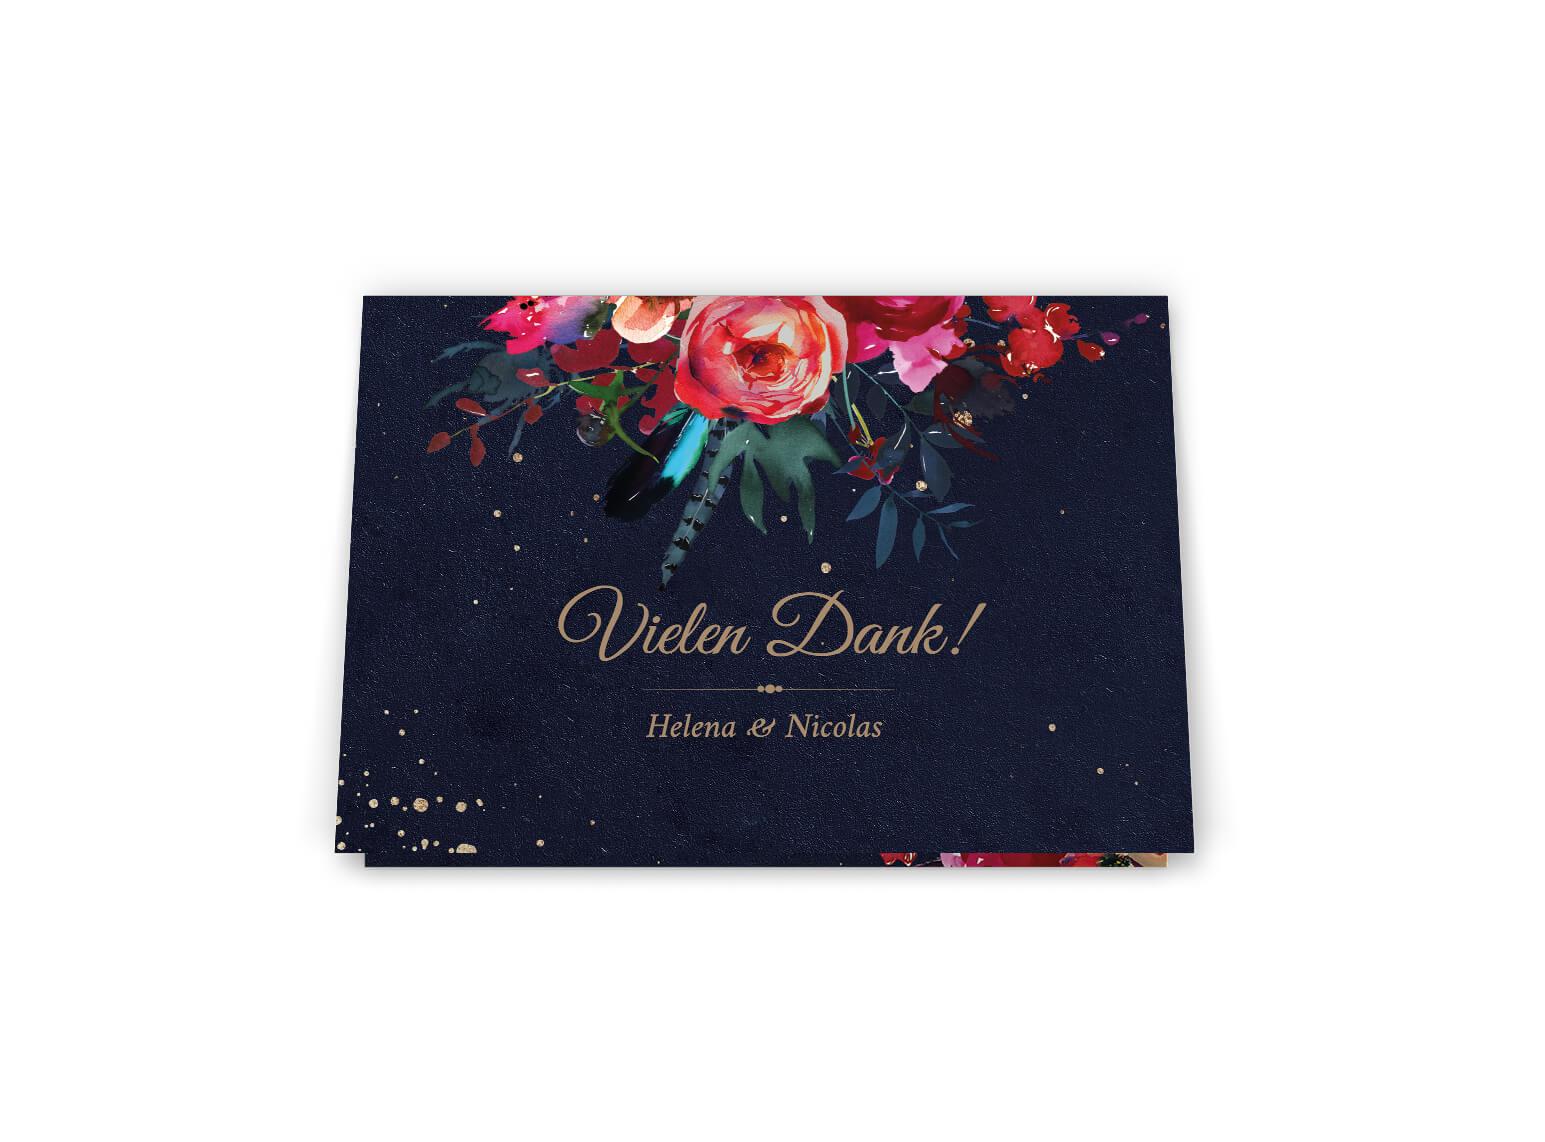 Nacht Dankeskarte Boho Hochzeit   dunkle Blumenverzierte Dankeskarte Klappkarte Din A6